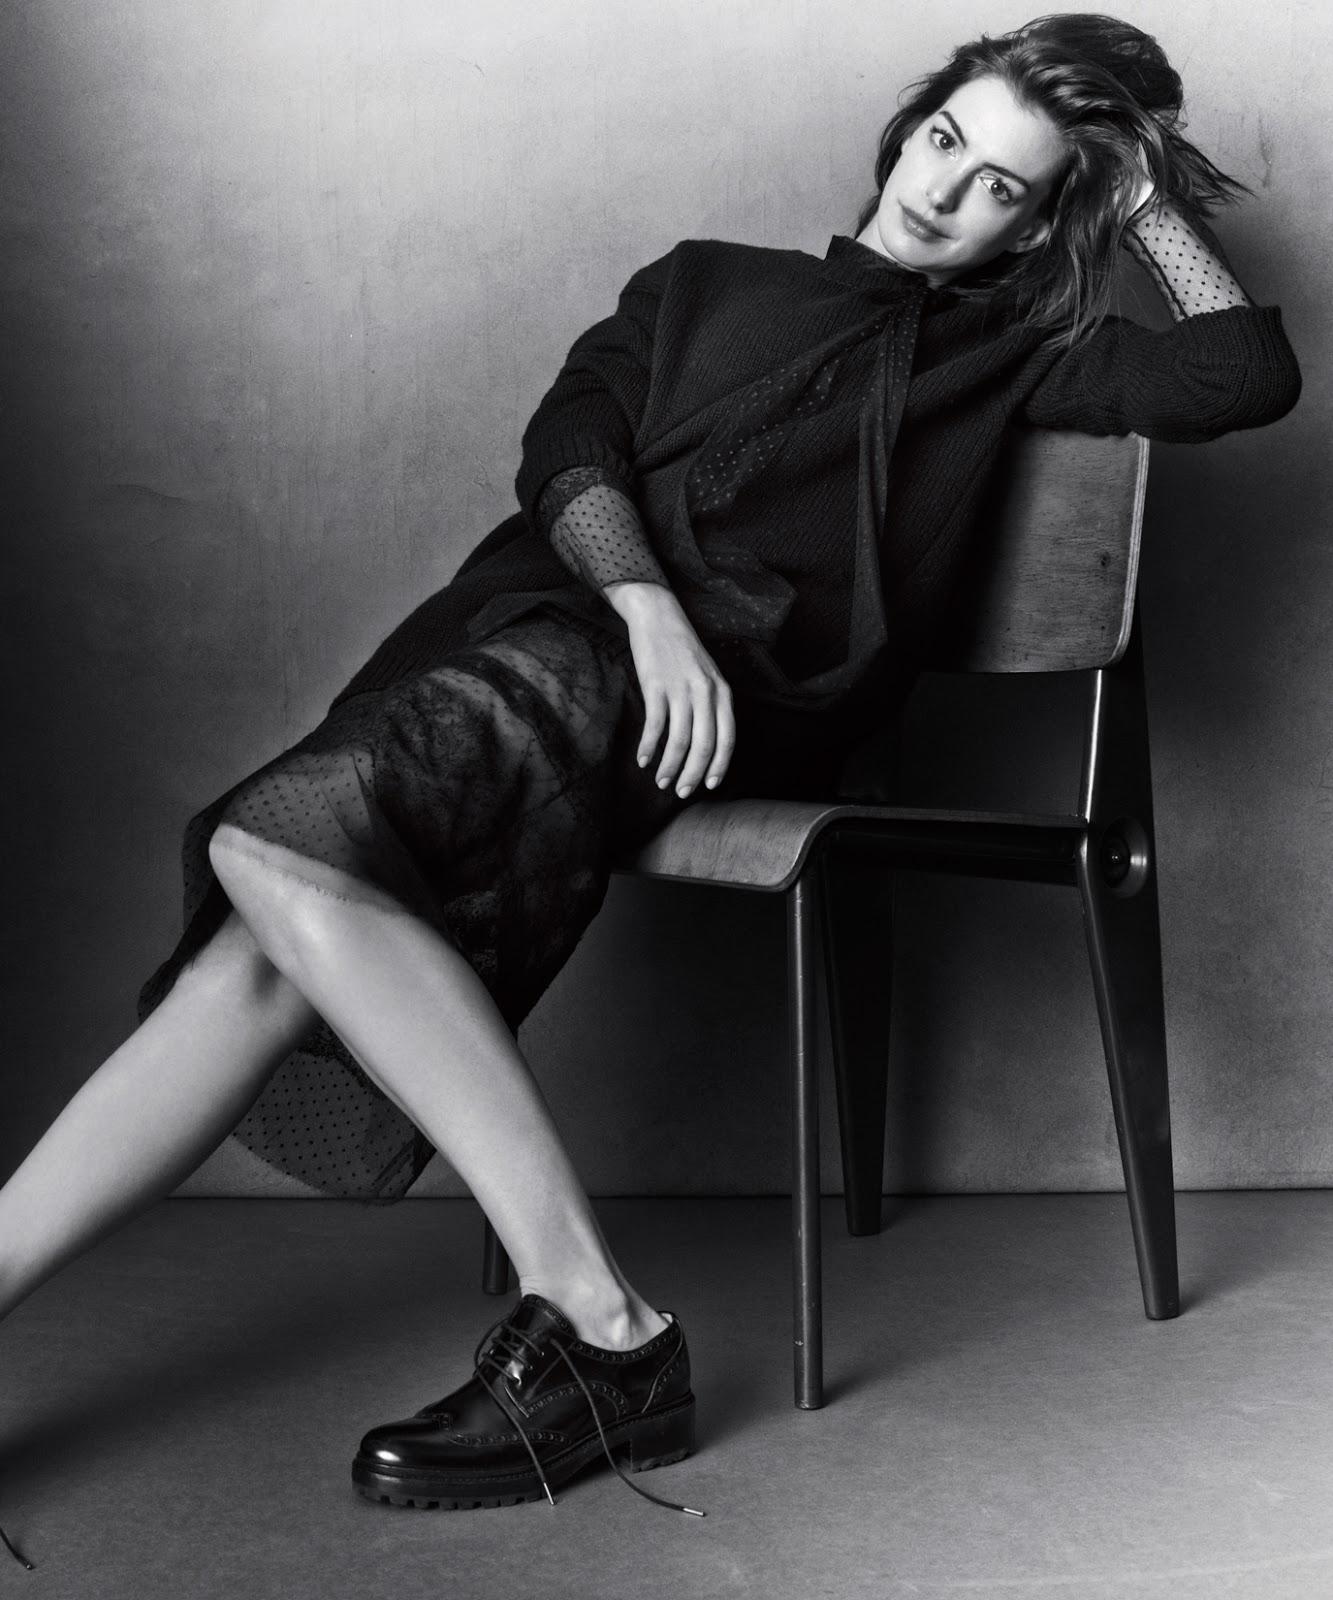 Arts Cross Stitch: Actress, Singer @ Anne Hathaway